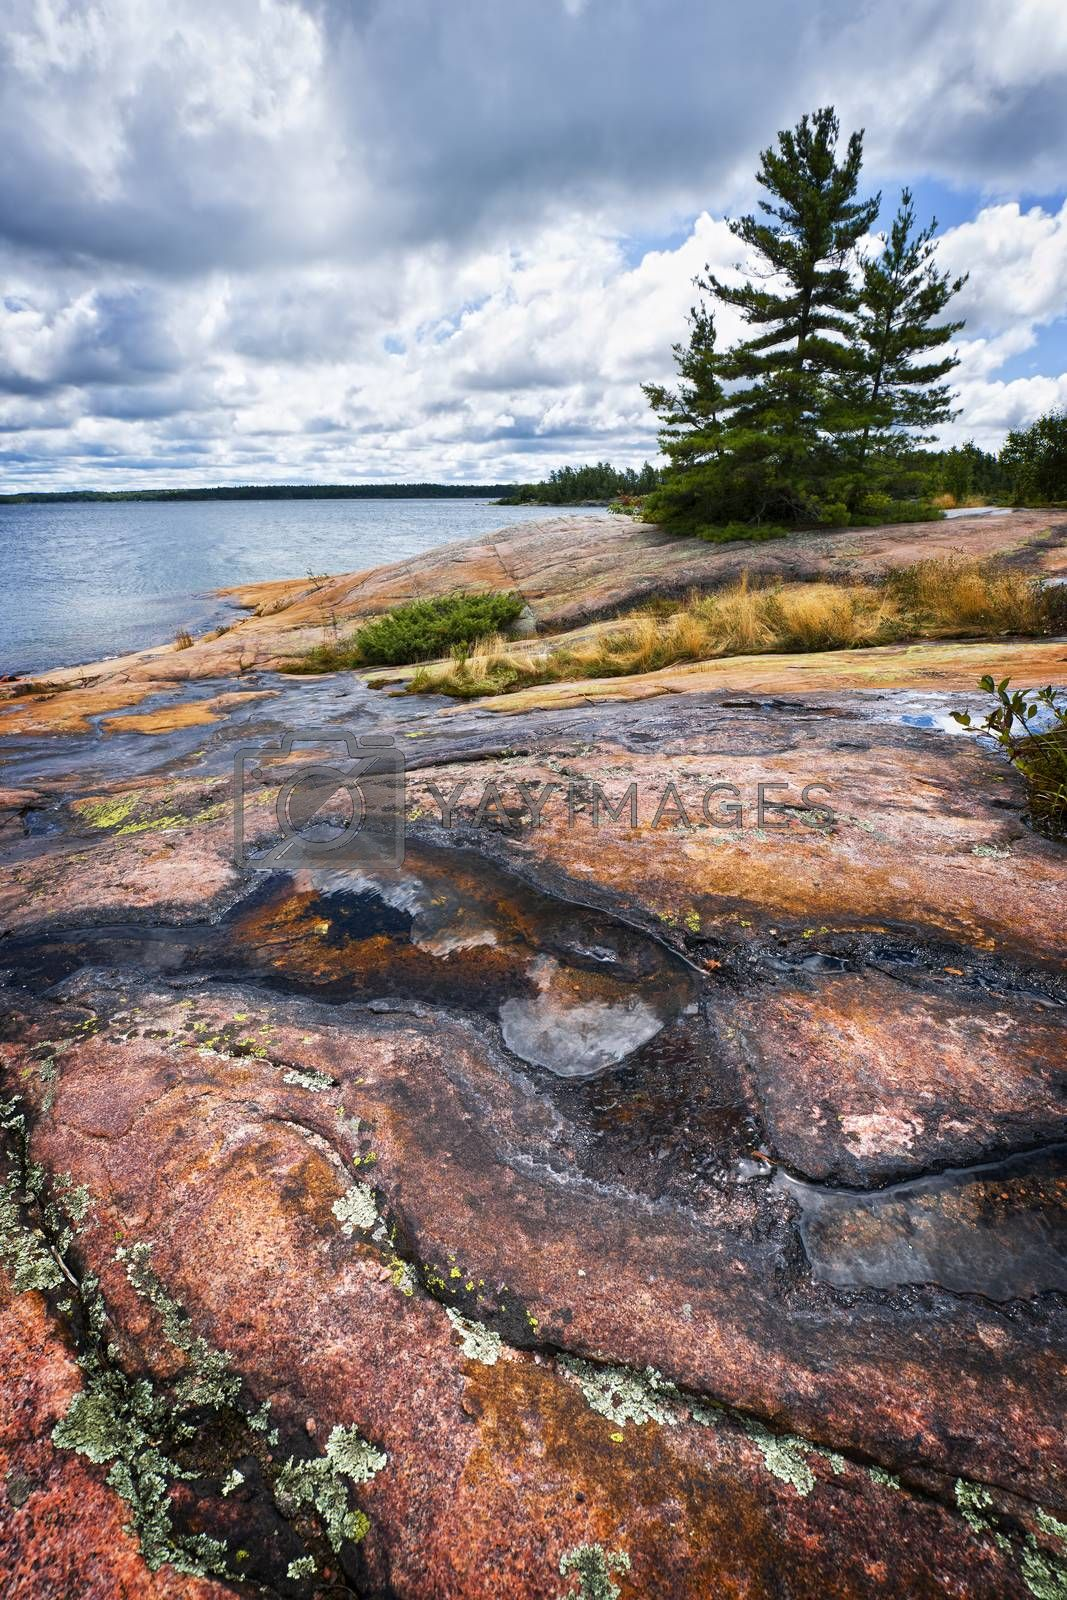 Rocky lake shore of Georgian Bay in Killbear provincial park near Parry Sound, Ontario Canada